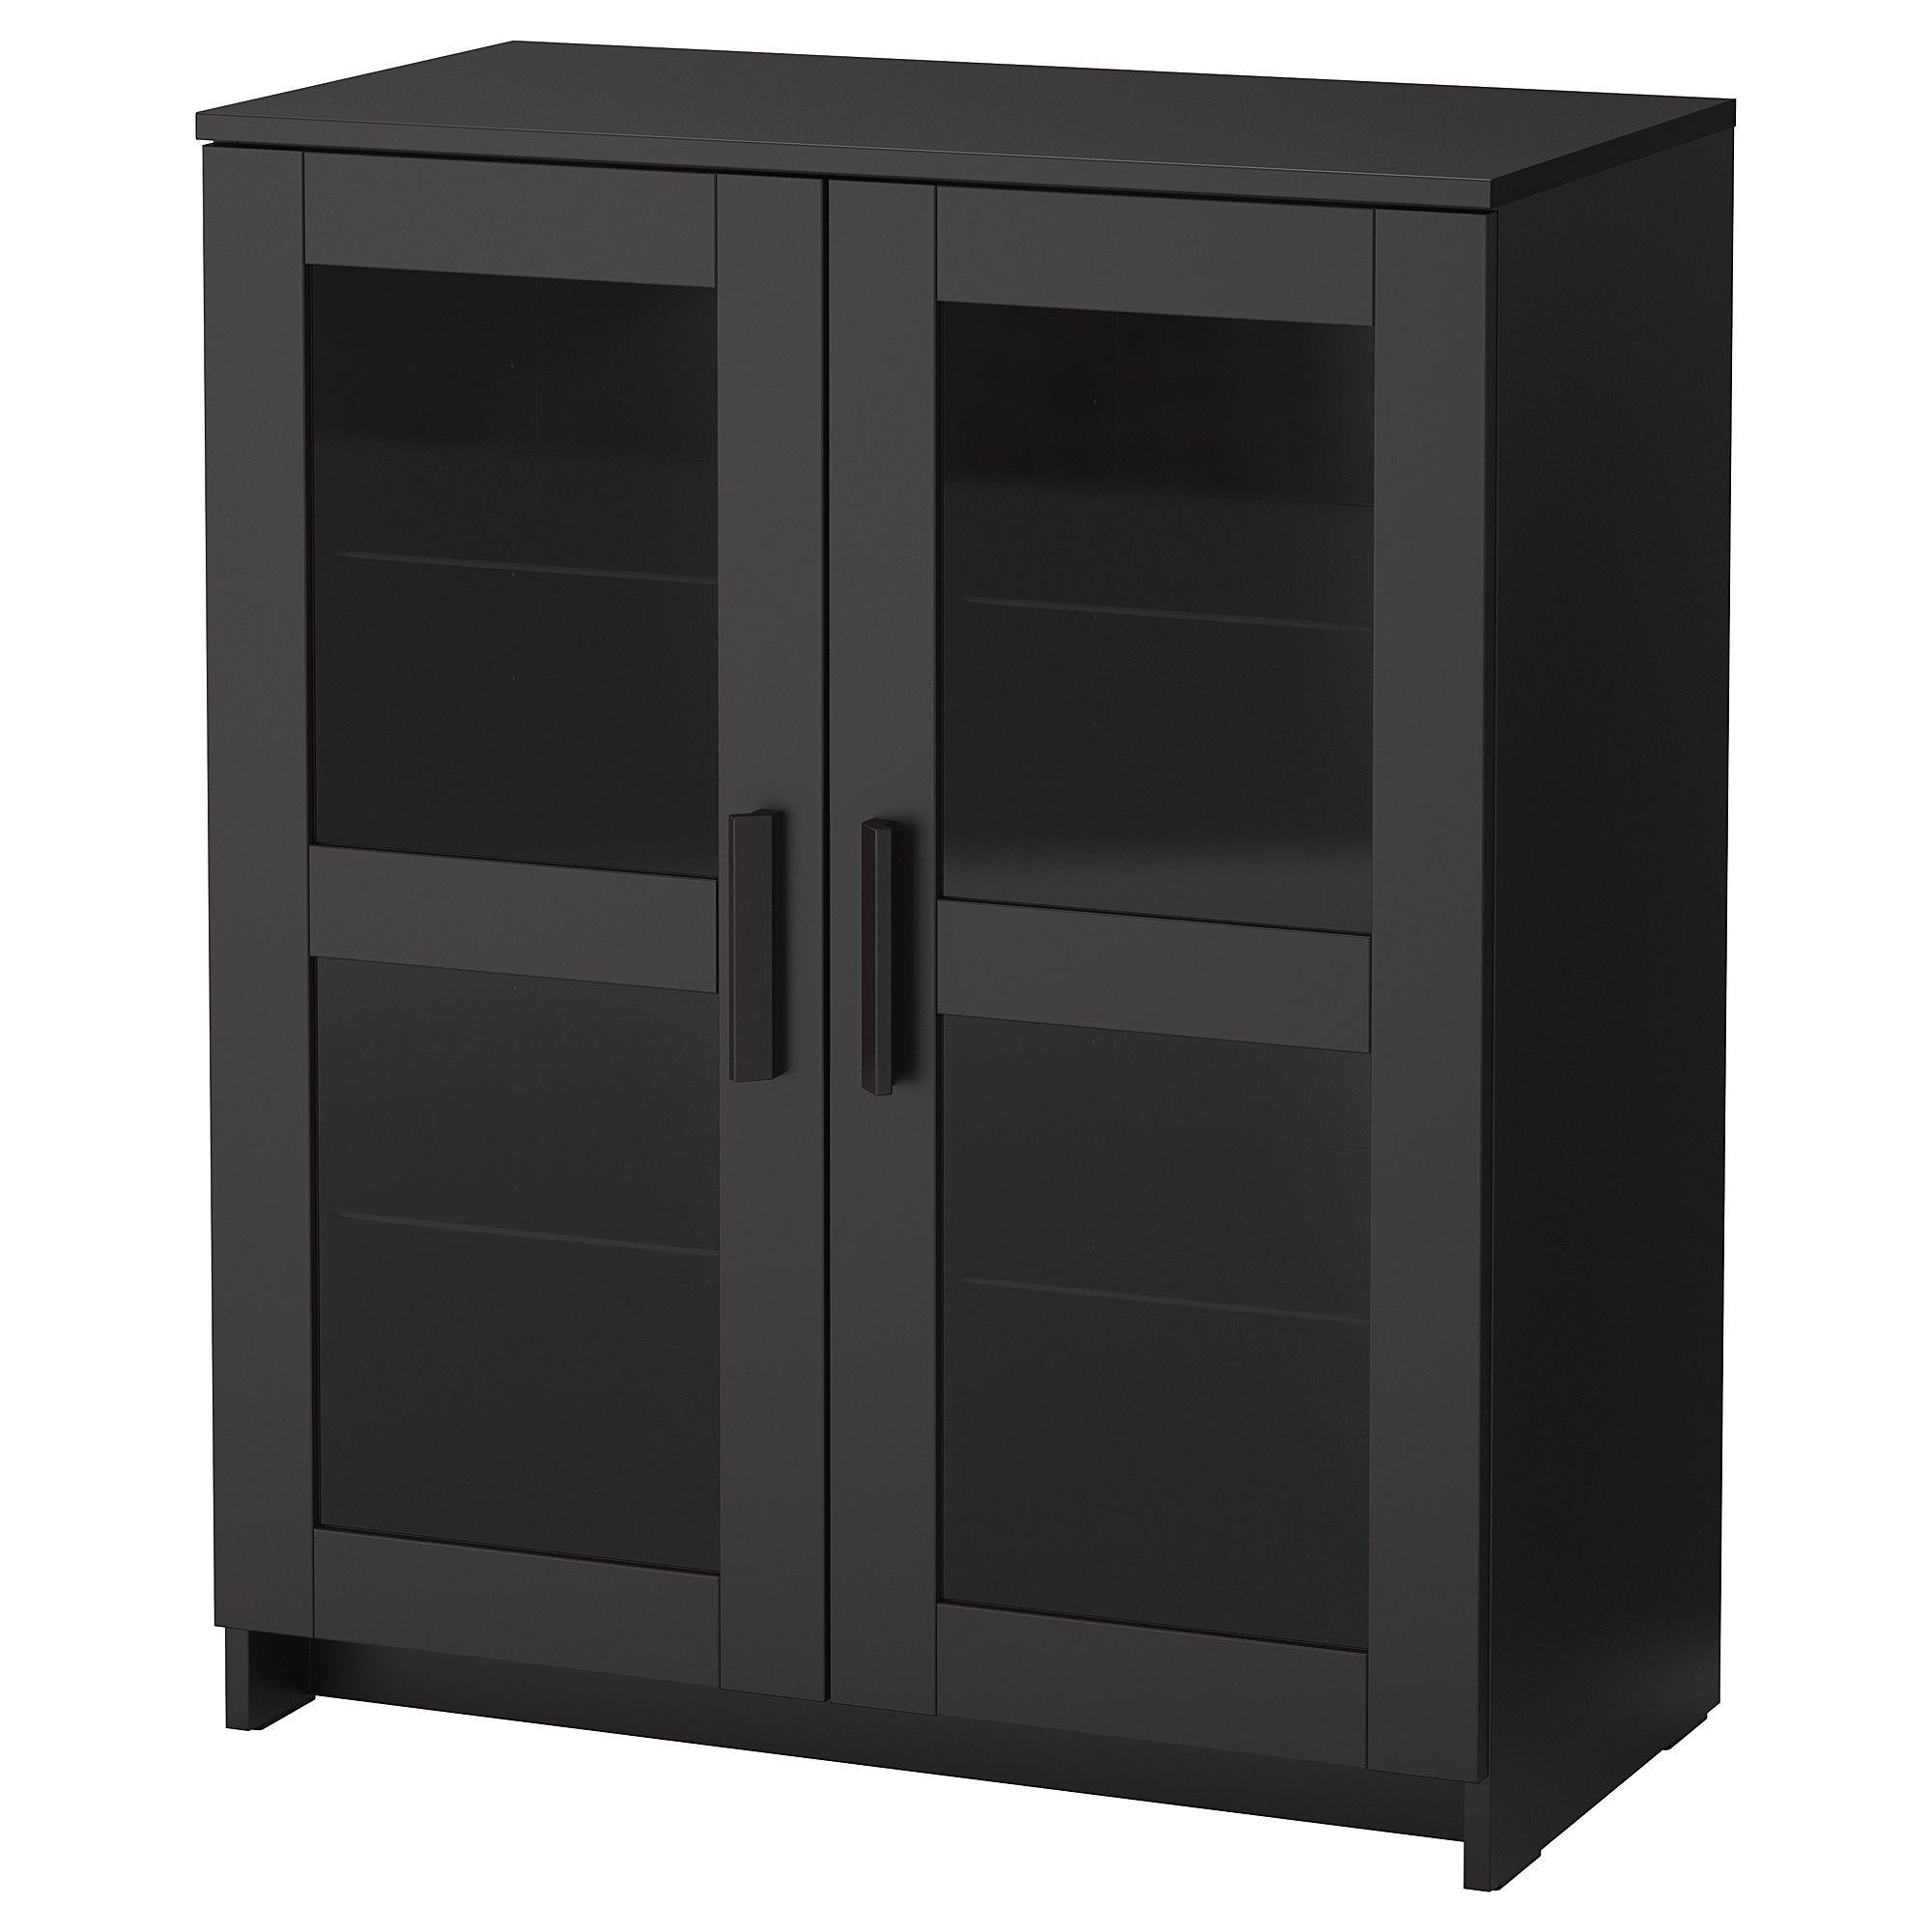 Brimnes Cabinet With Doors Glass Black 78x95 Cm Glass Cabinet Doors Cabinet Doors Ikea